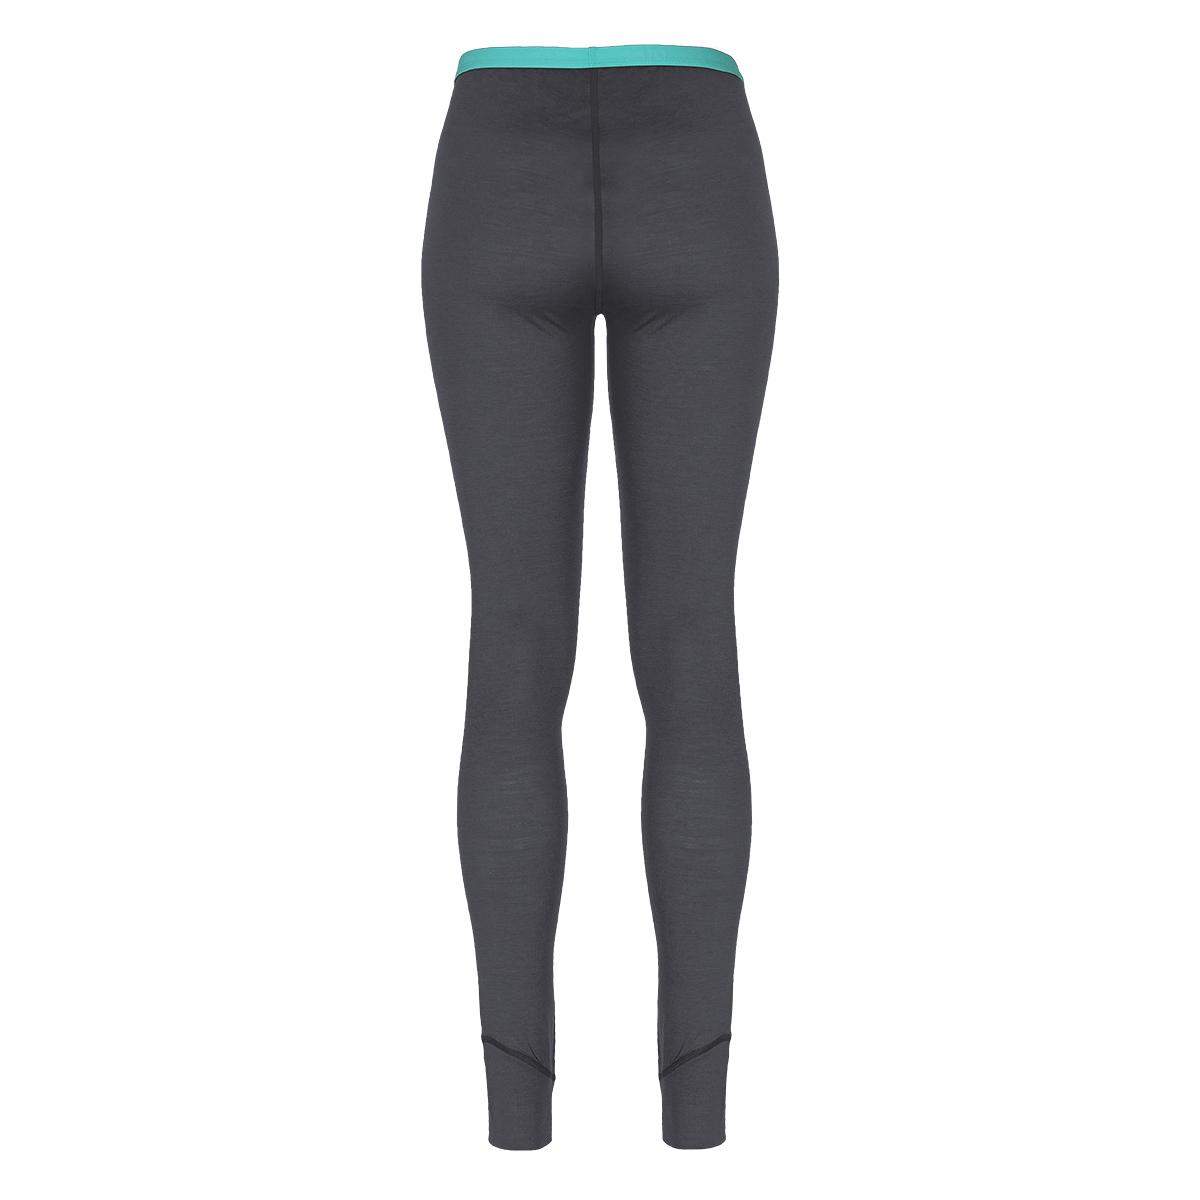 Zajo Elsa Merino W Pants Black/Gray 2